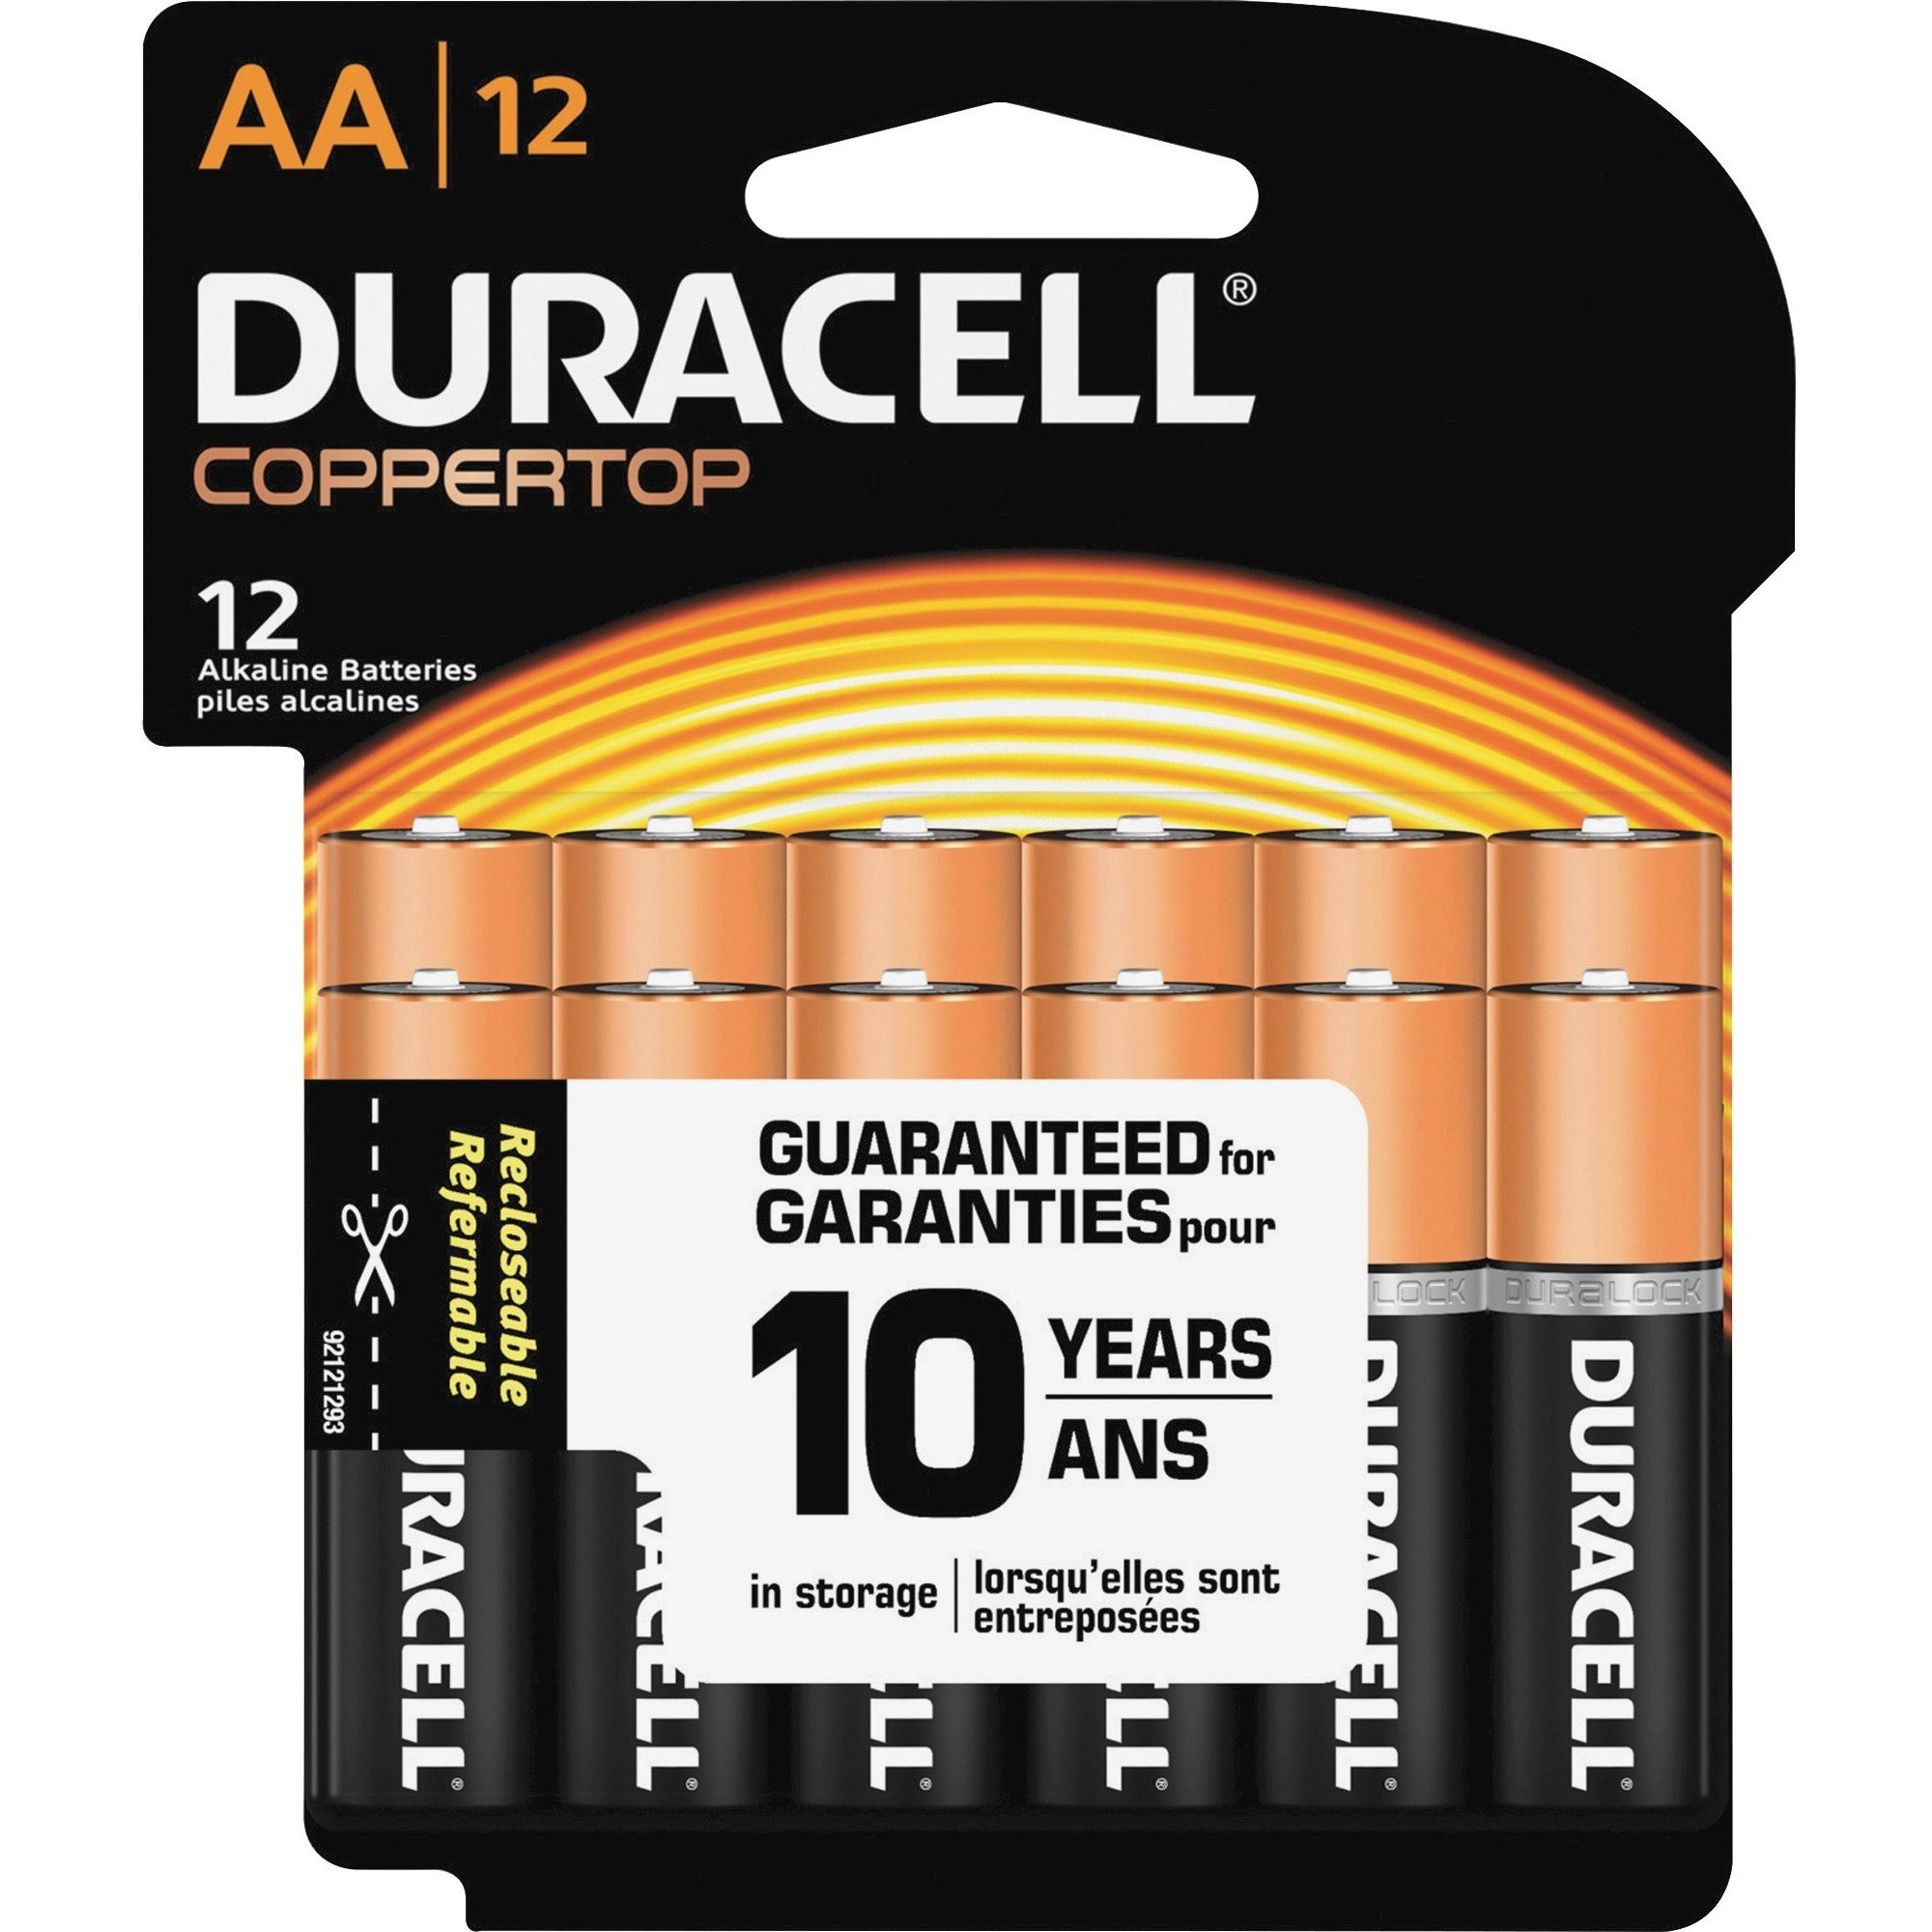 Duracell Coppertop Alkaline AA Batteries - MN1500 - 12/Pack